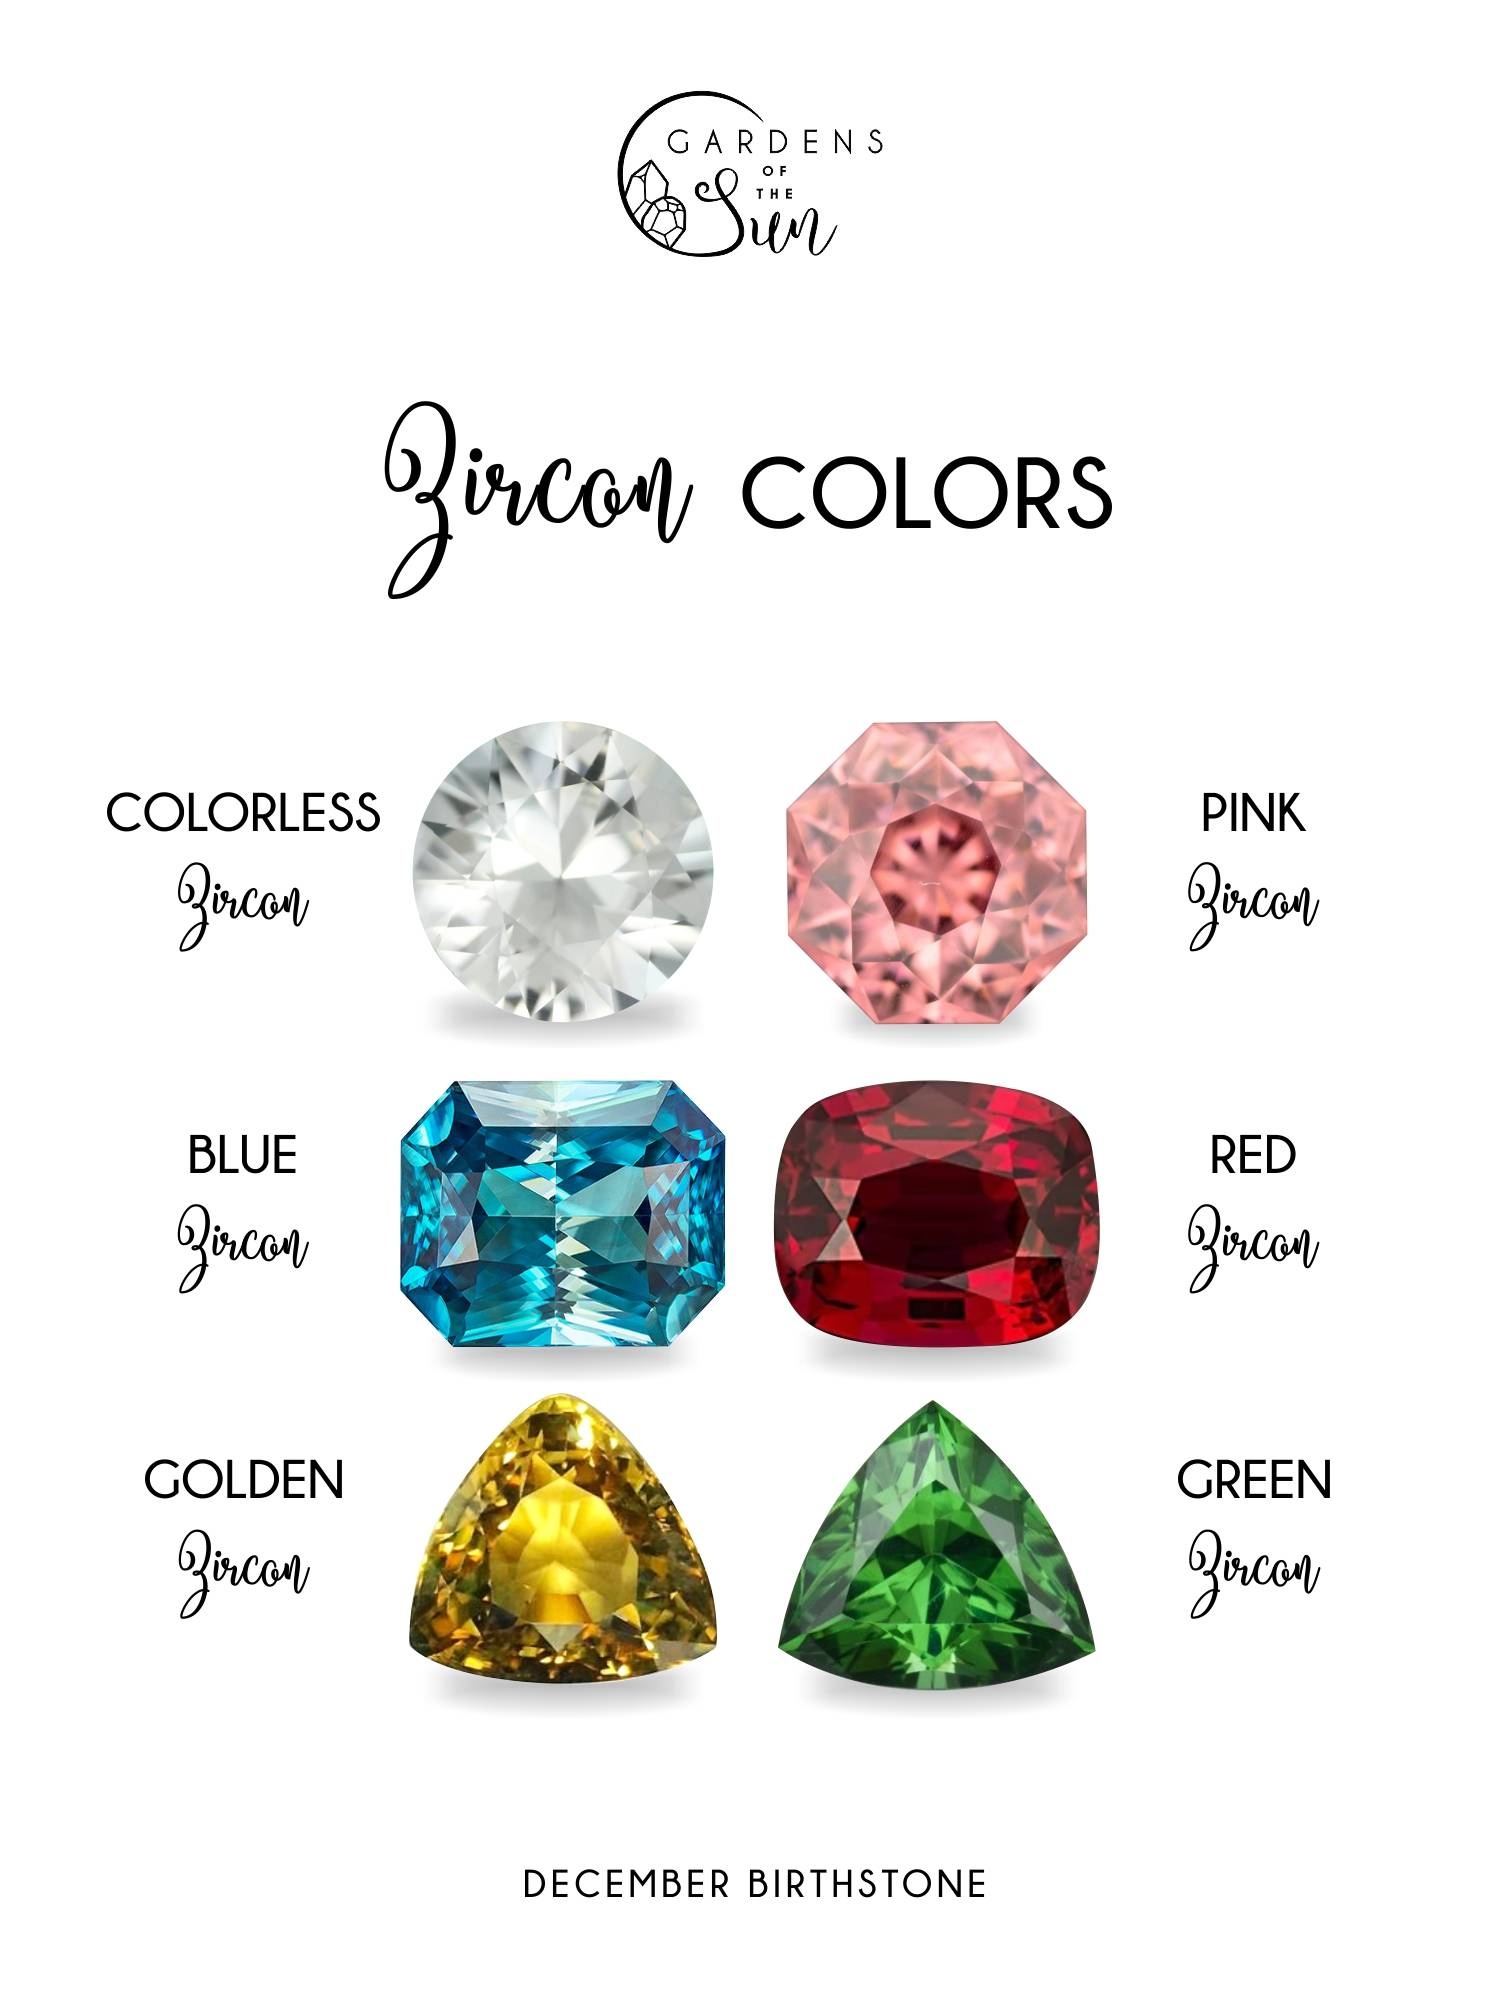 Zircon colors